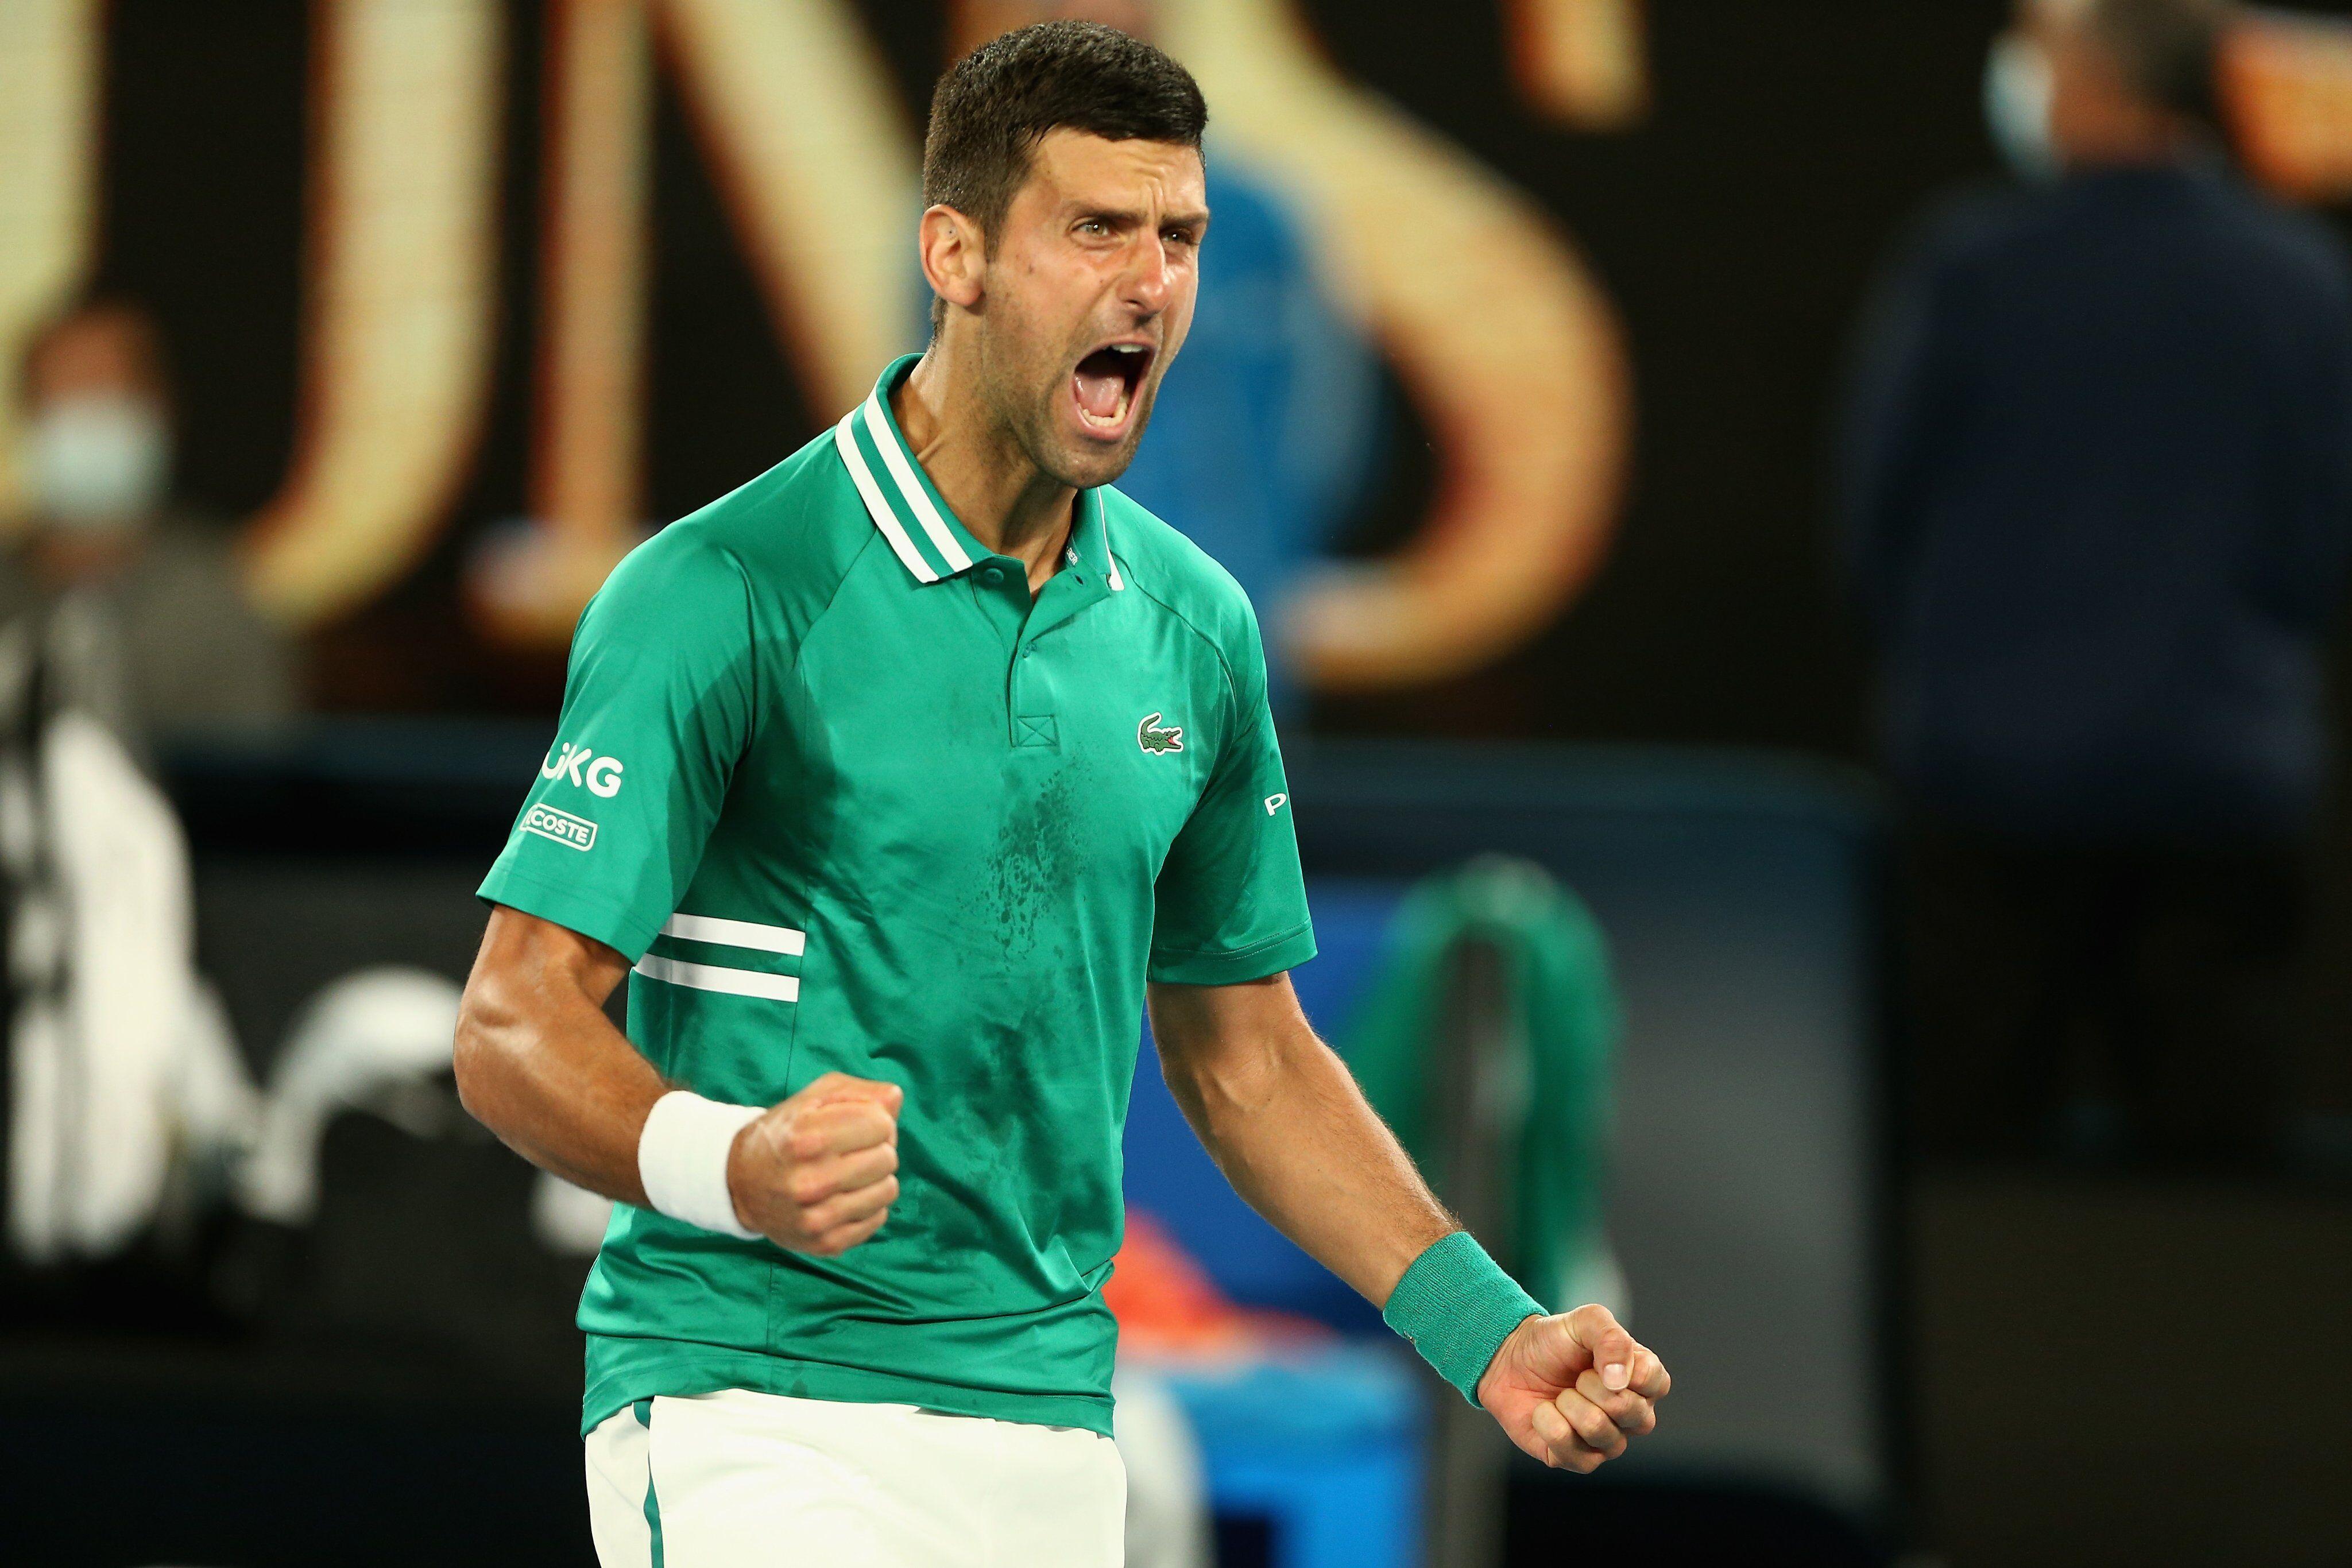 310 weeks! Djokovic equals Roger Federer's world first-week record